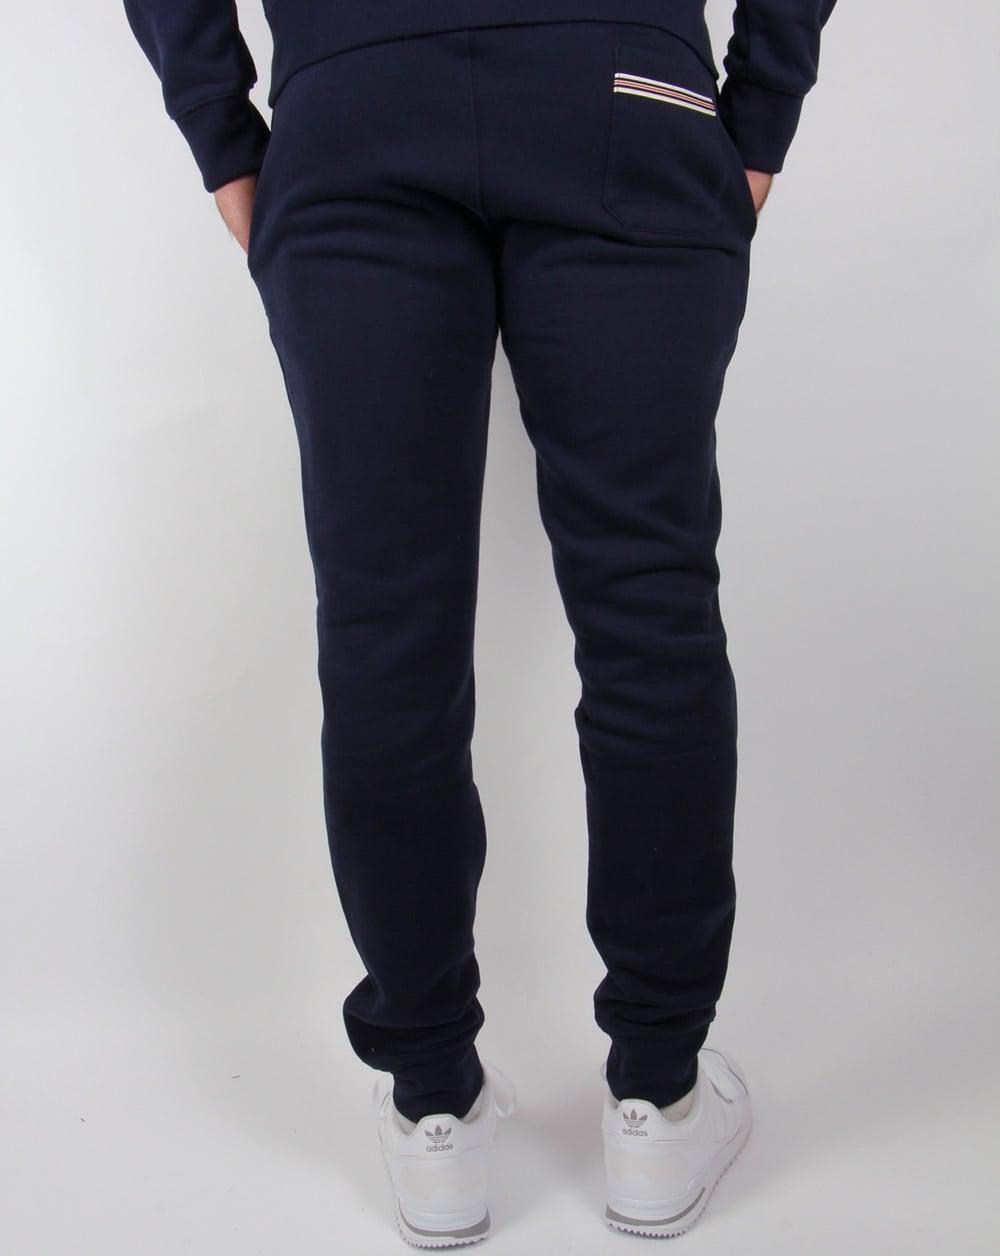 8cea5f28f5fa Fila Vintage Livata Cuffed Track Pants Navy,bottoms,tracksuit,mens